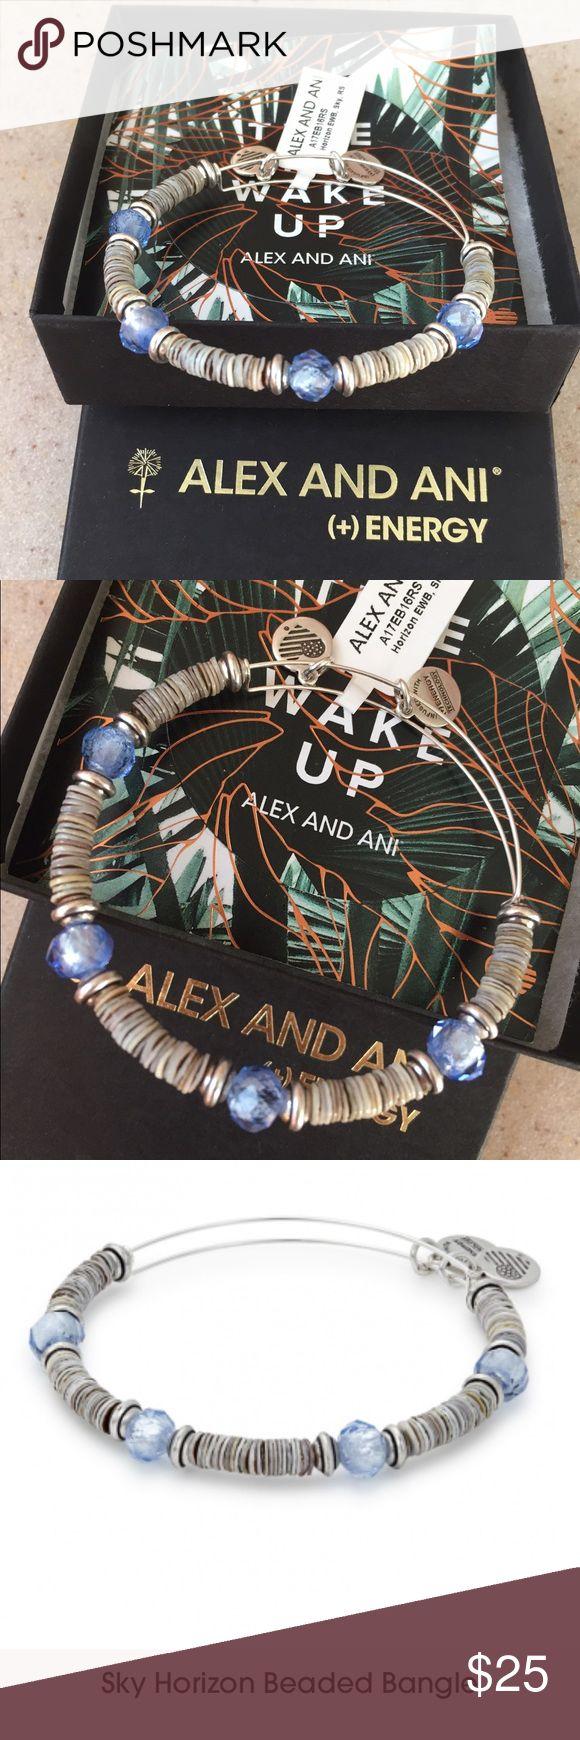 NEW Alex and ani bracelet: sky horizon bangle Sky Horizon beaded bangle: new authentic Alex and ani bracelet. Rare item, not many in stores. Brand new item with tags still attached Alex & Ani Jewelry Bracelets